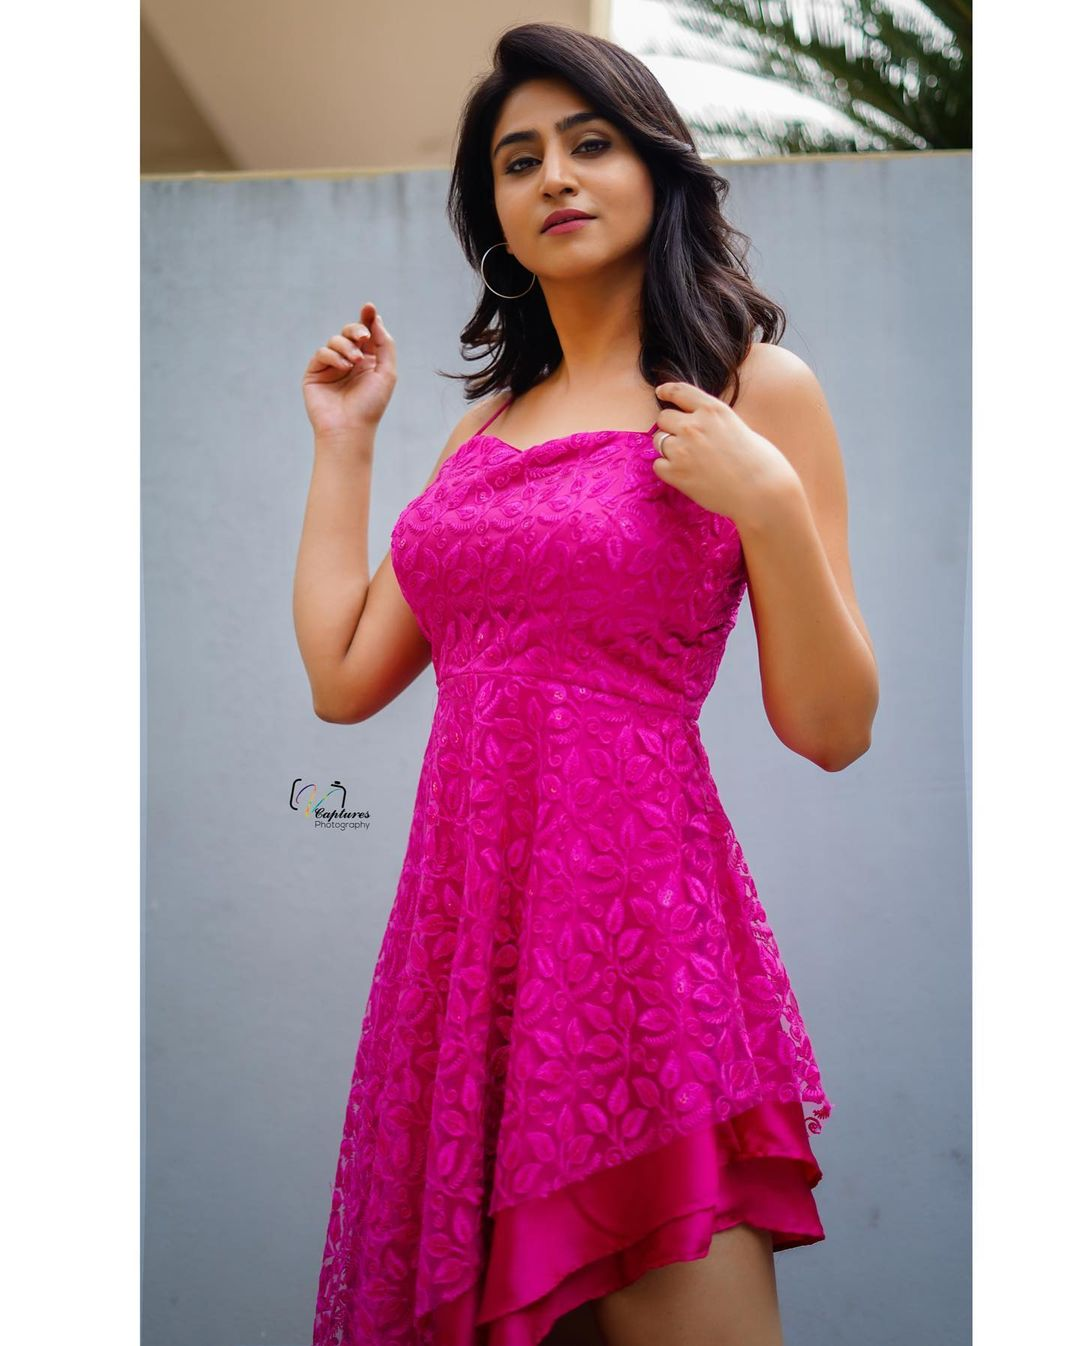 Beautiful anchor Varshini Sounderajan in pink color knee length dress. 2021-05-20